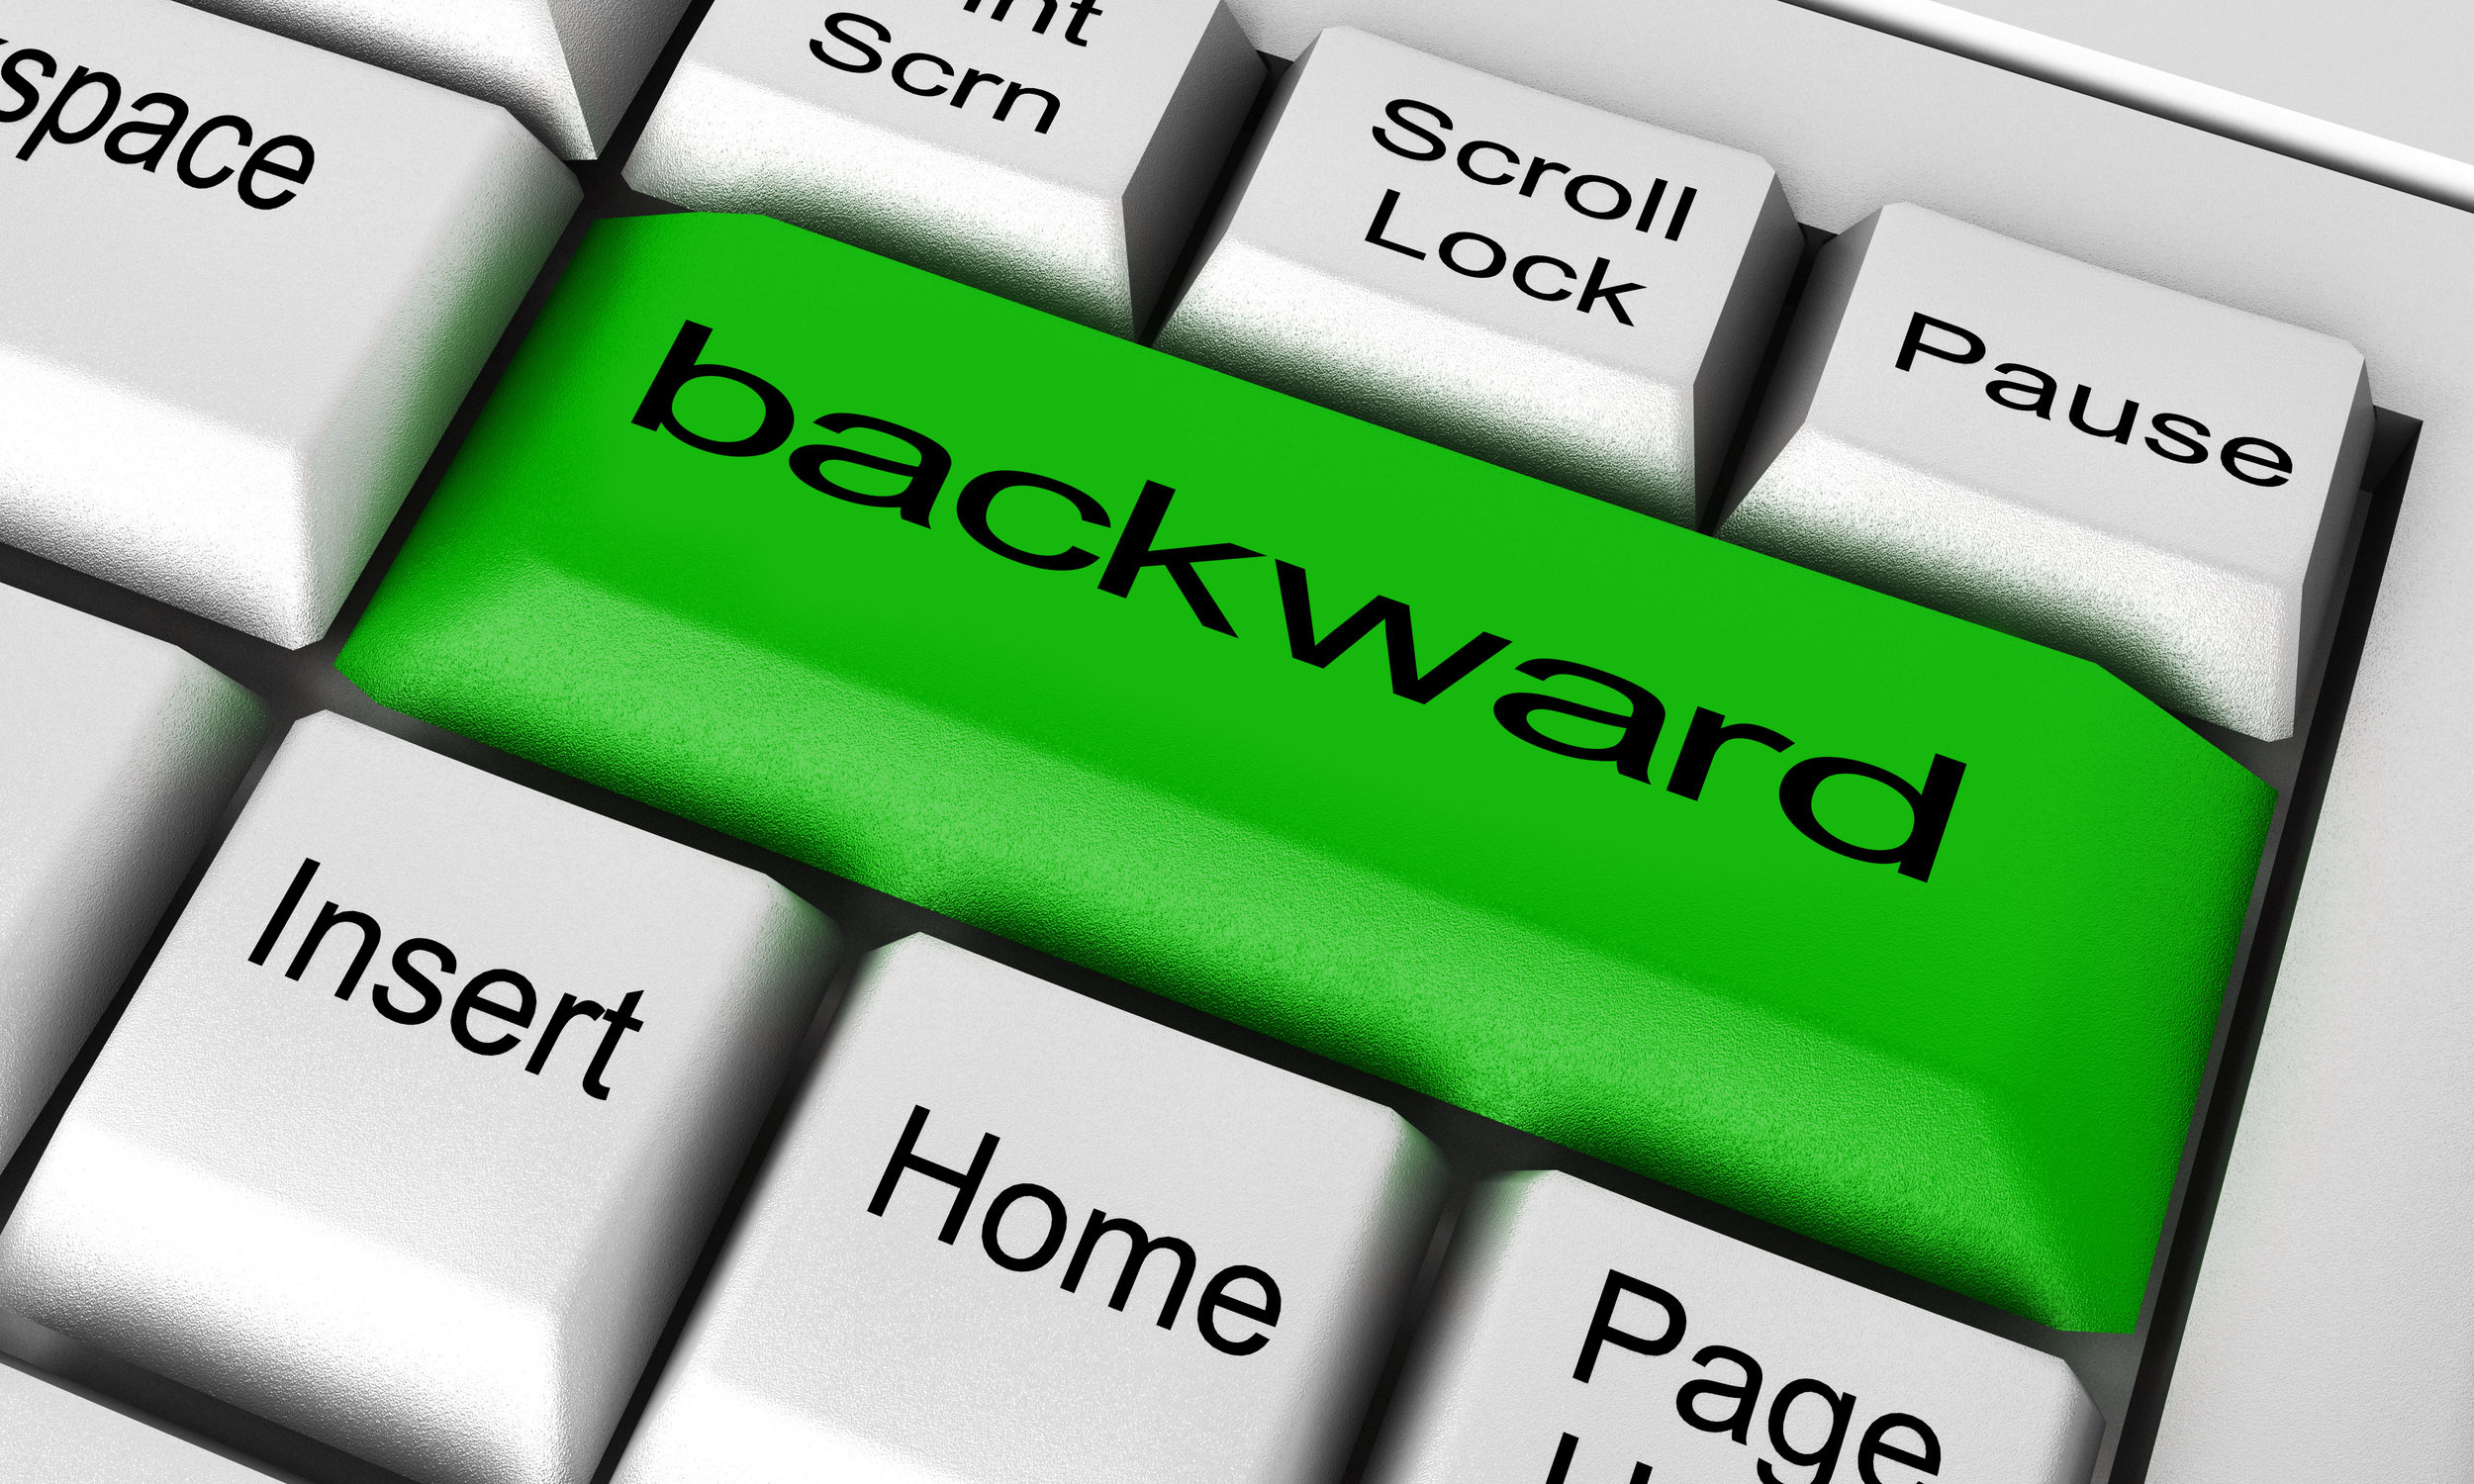 graphicstock-backward-word-on-keyboard-button_rwb2EdfOuW.jpg